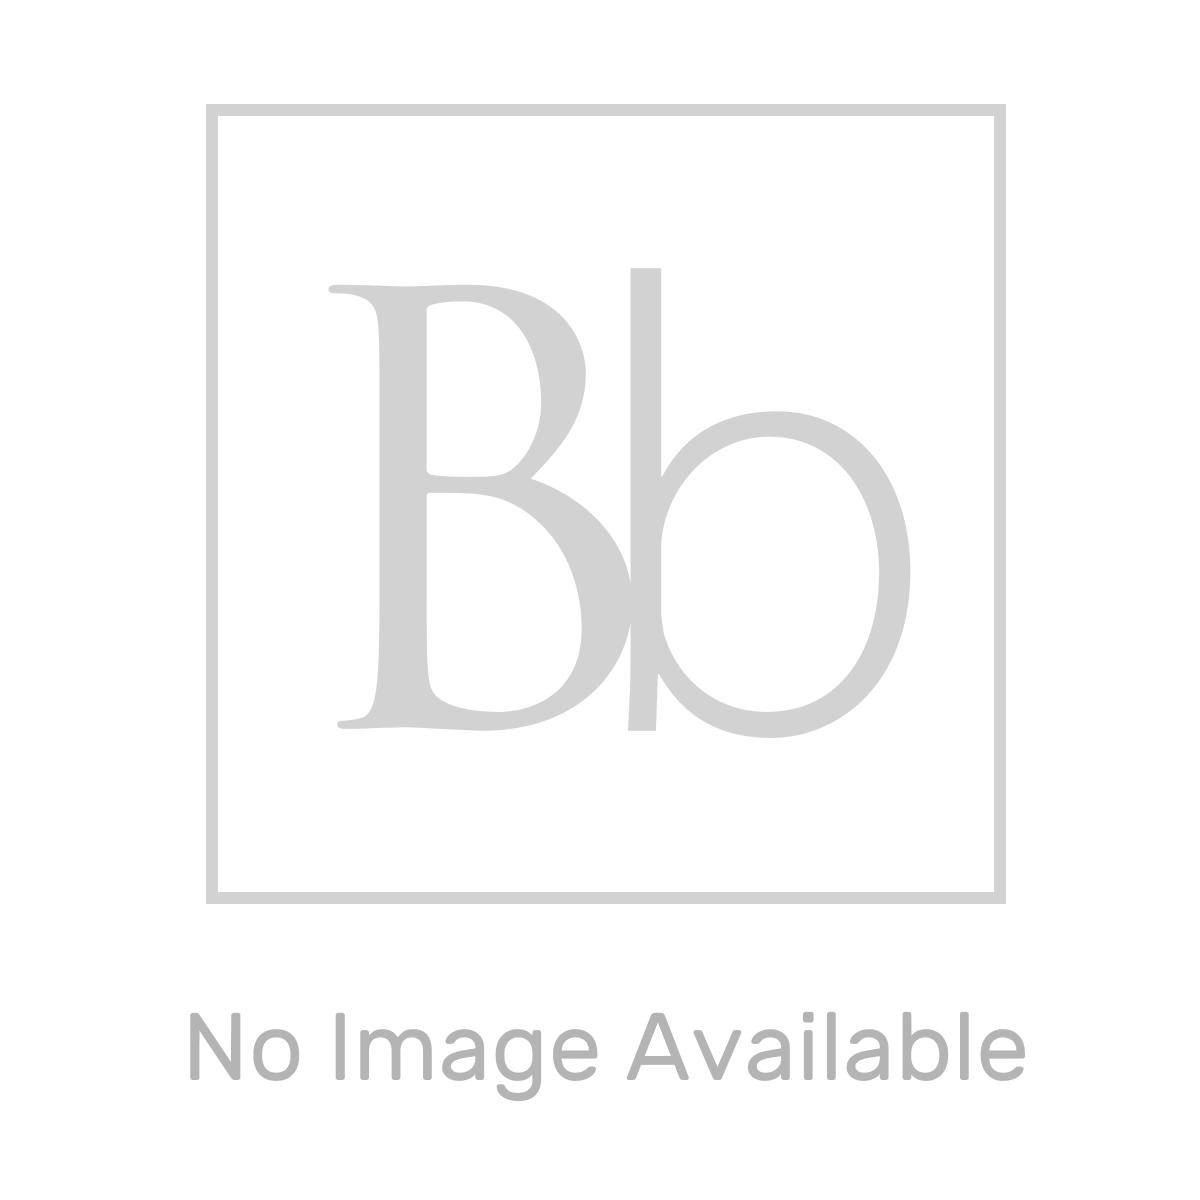 RAK Series 600 Close Coupled Toilet and 400 Series Walnut Mini Vanity Unit Drawing